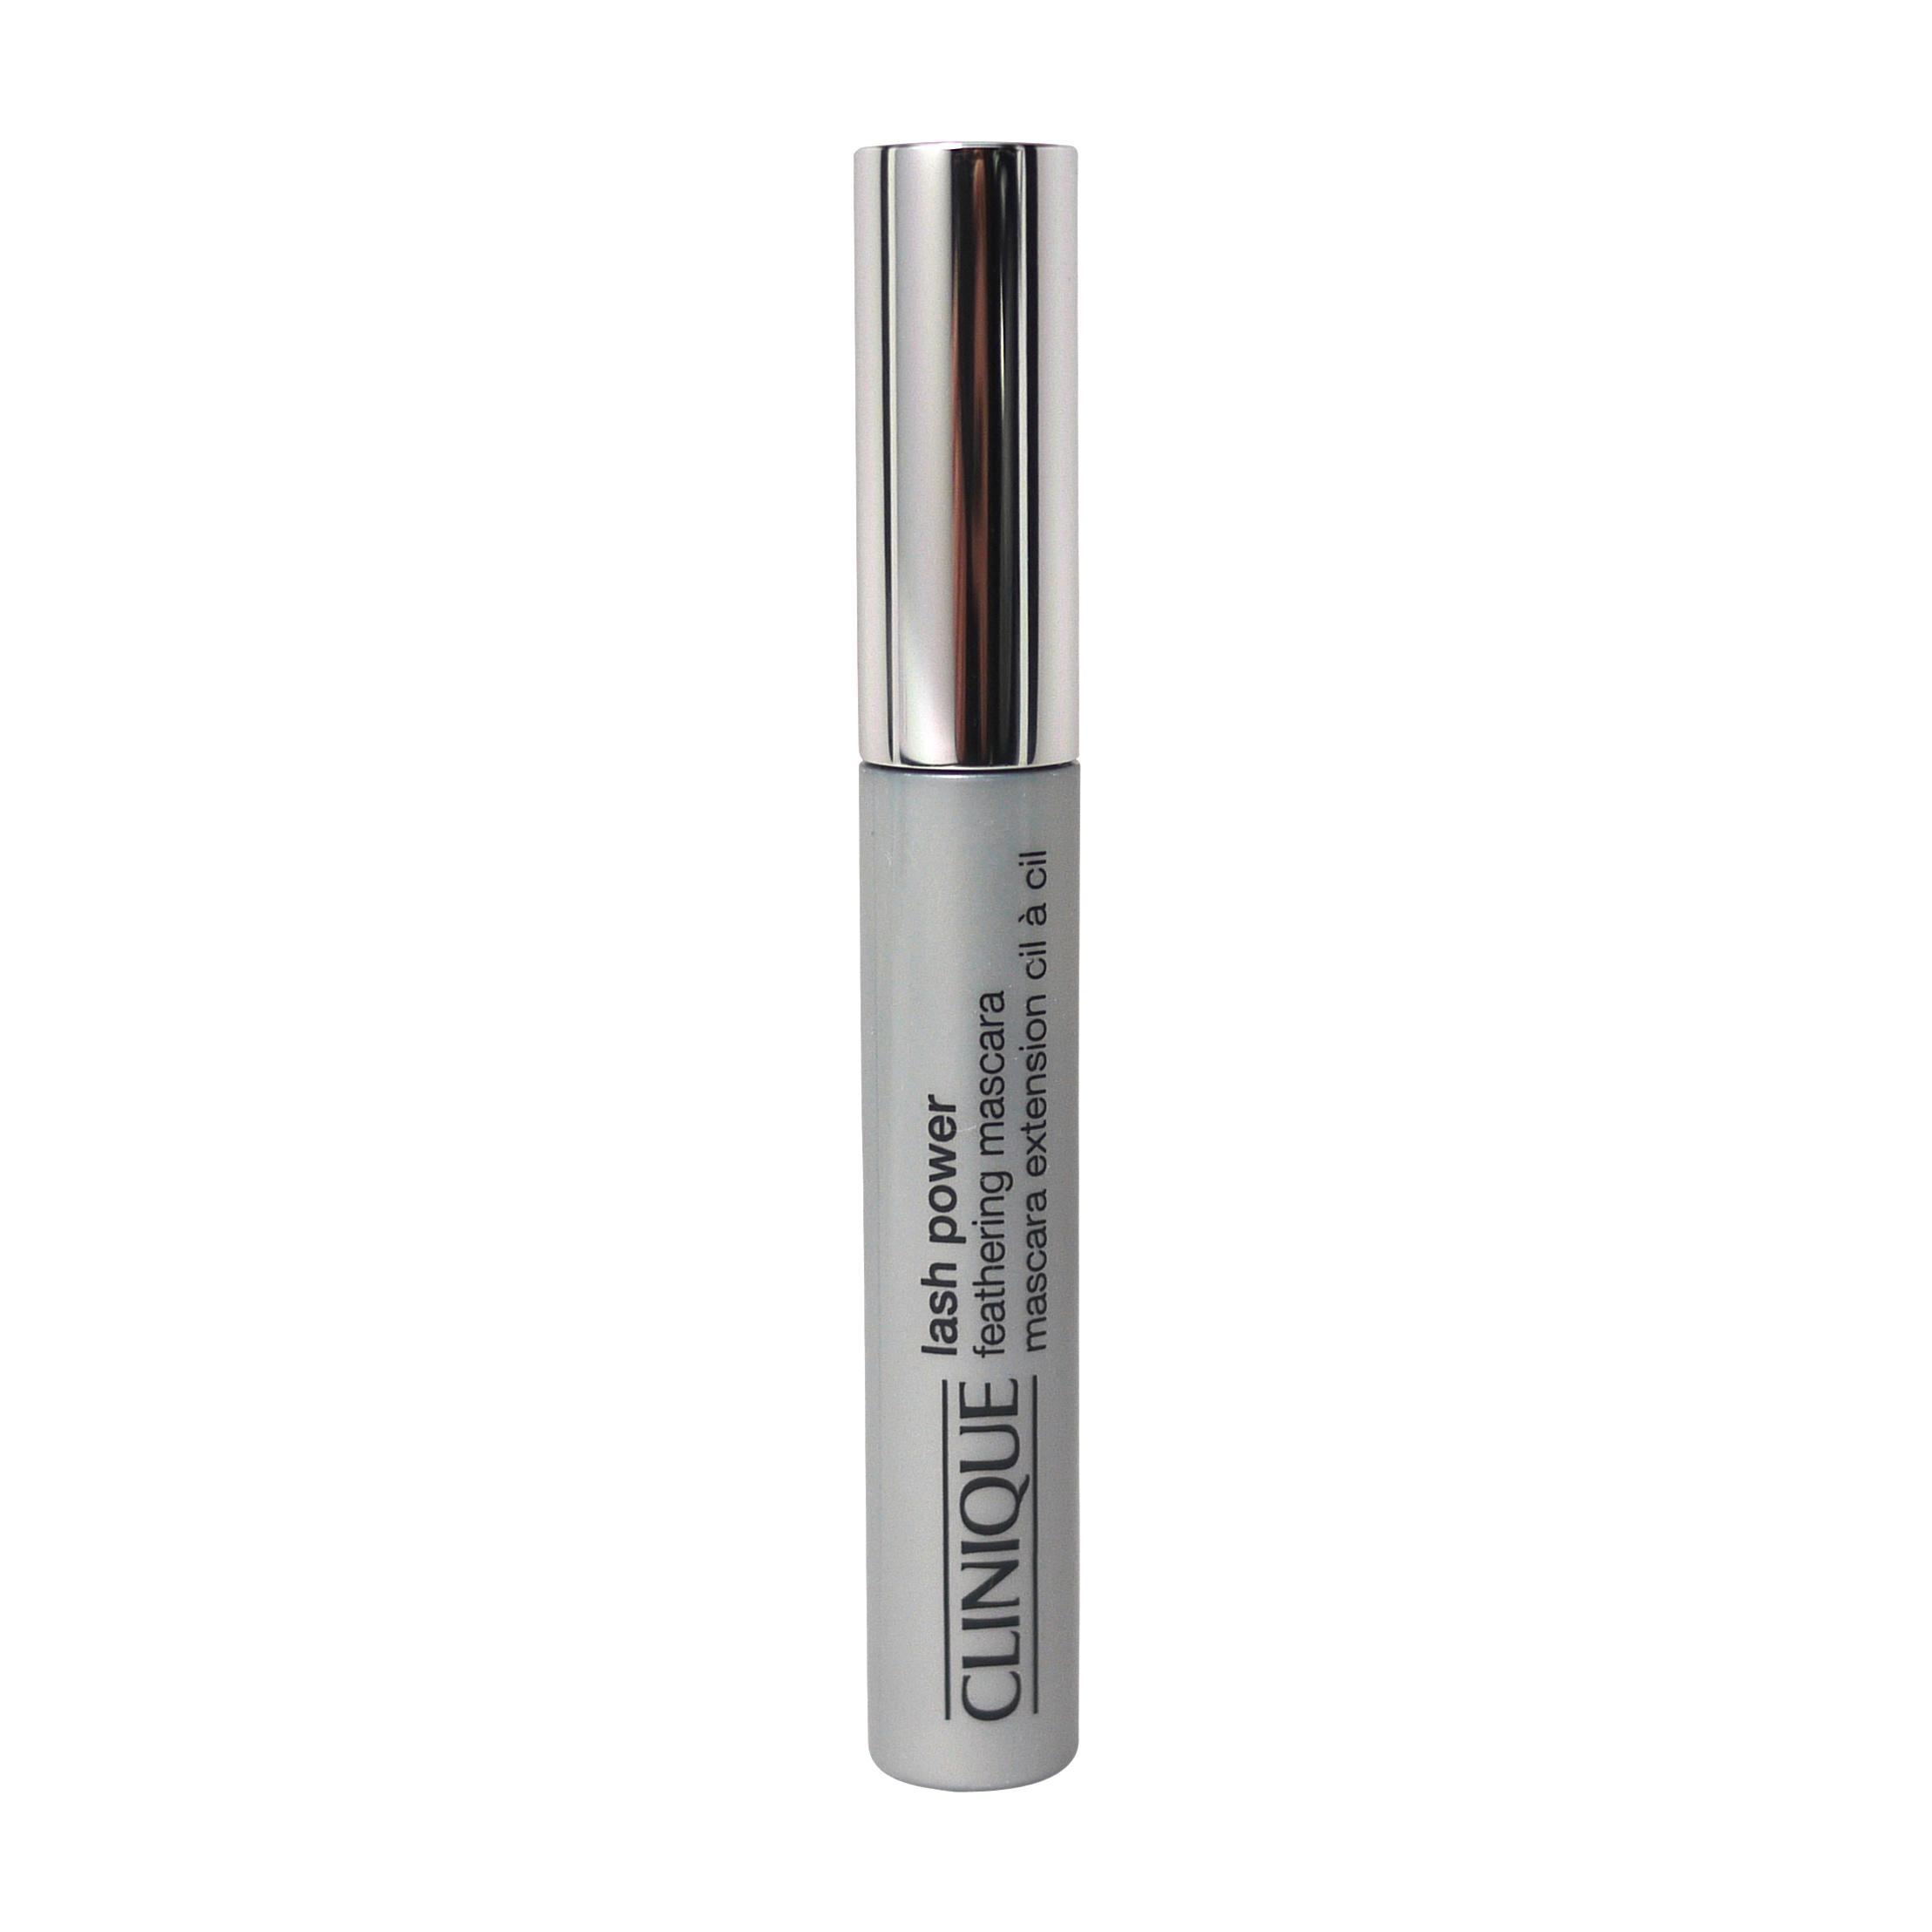 Clinique Lash Power Feathering Mascara Black Onyx 01